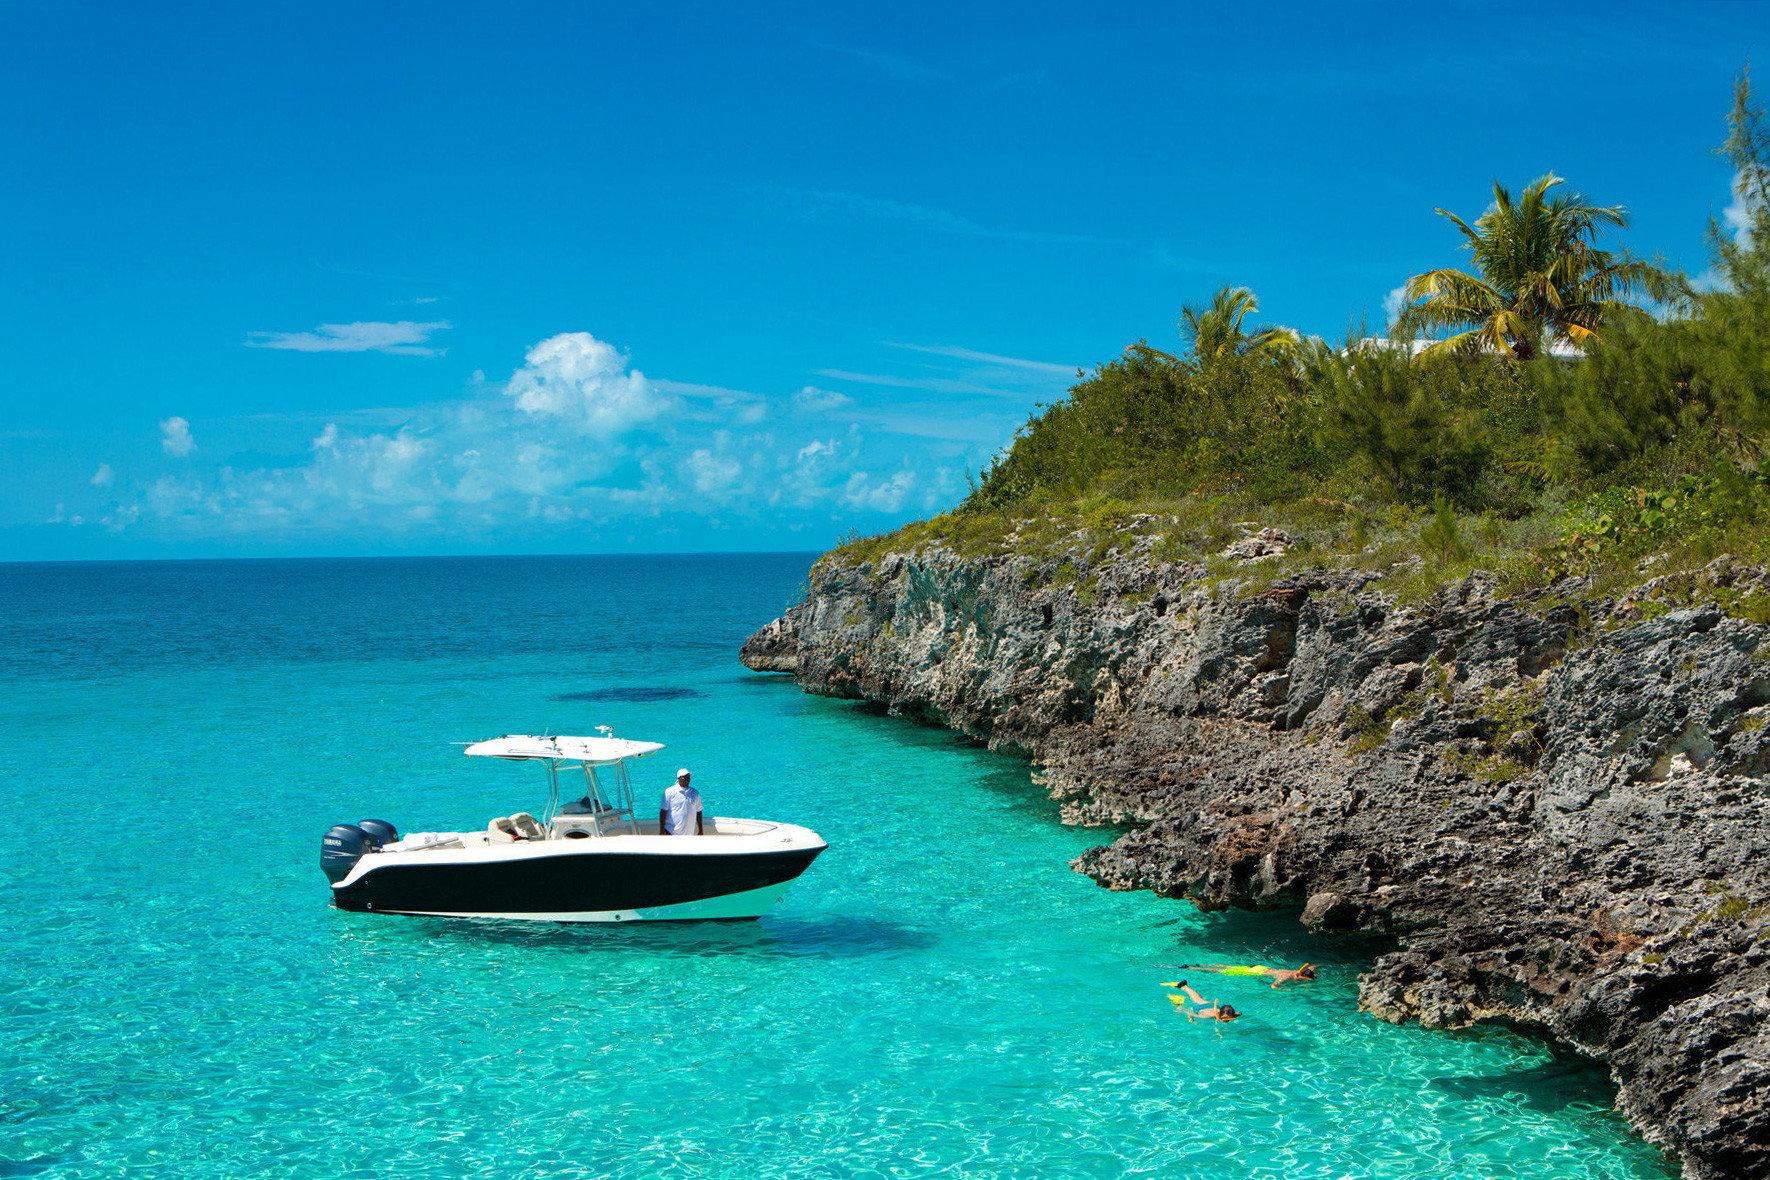 Hotels water outdoor sky Sea landform Boat geographical feature shore Coast Ocean archipelago vacation bay caribbean Island islet Beach Lagoon cove swimming pool cape vehicle tropics terrain day